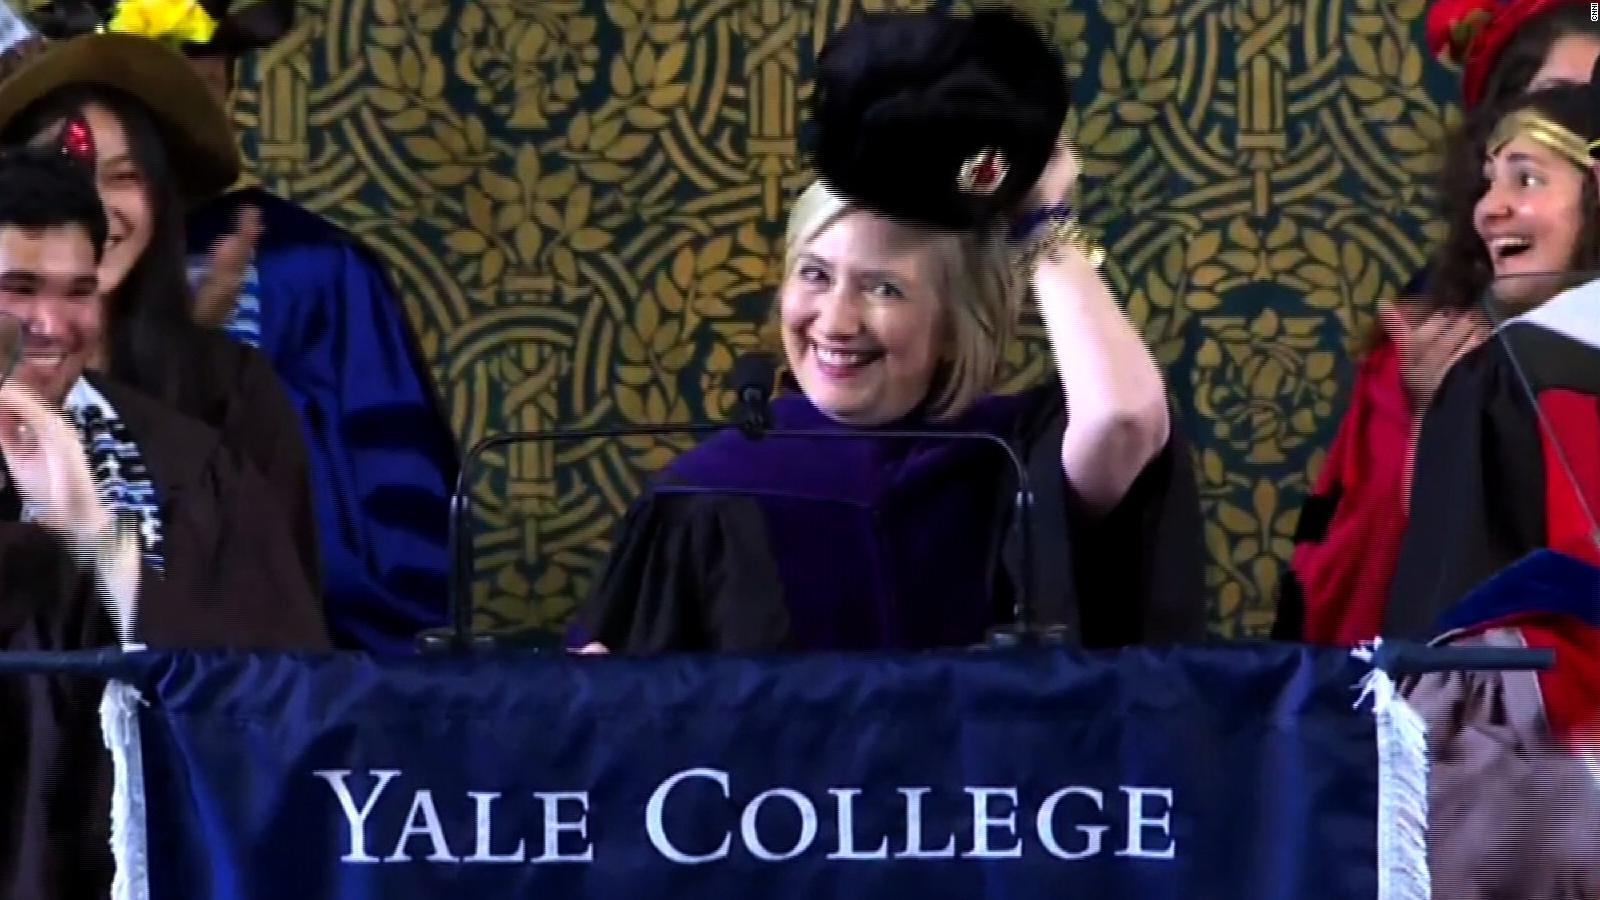 ca0c93fda034b9 Hillary Clinton trolls Trump with Russian hat - CNN Video